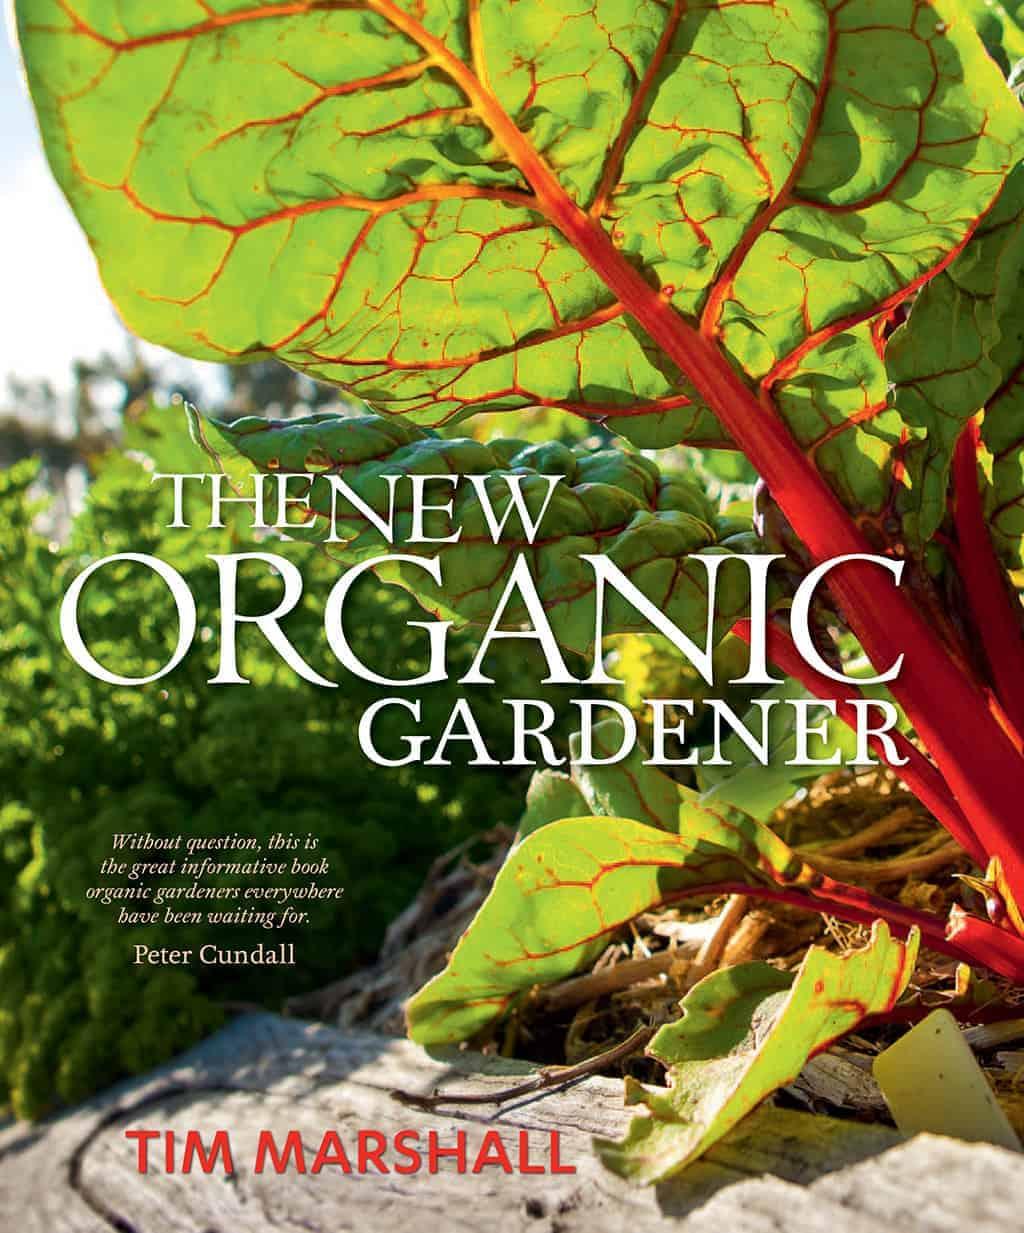 The New Organic Gardener Book Cover